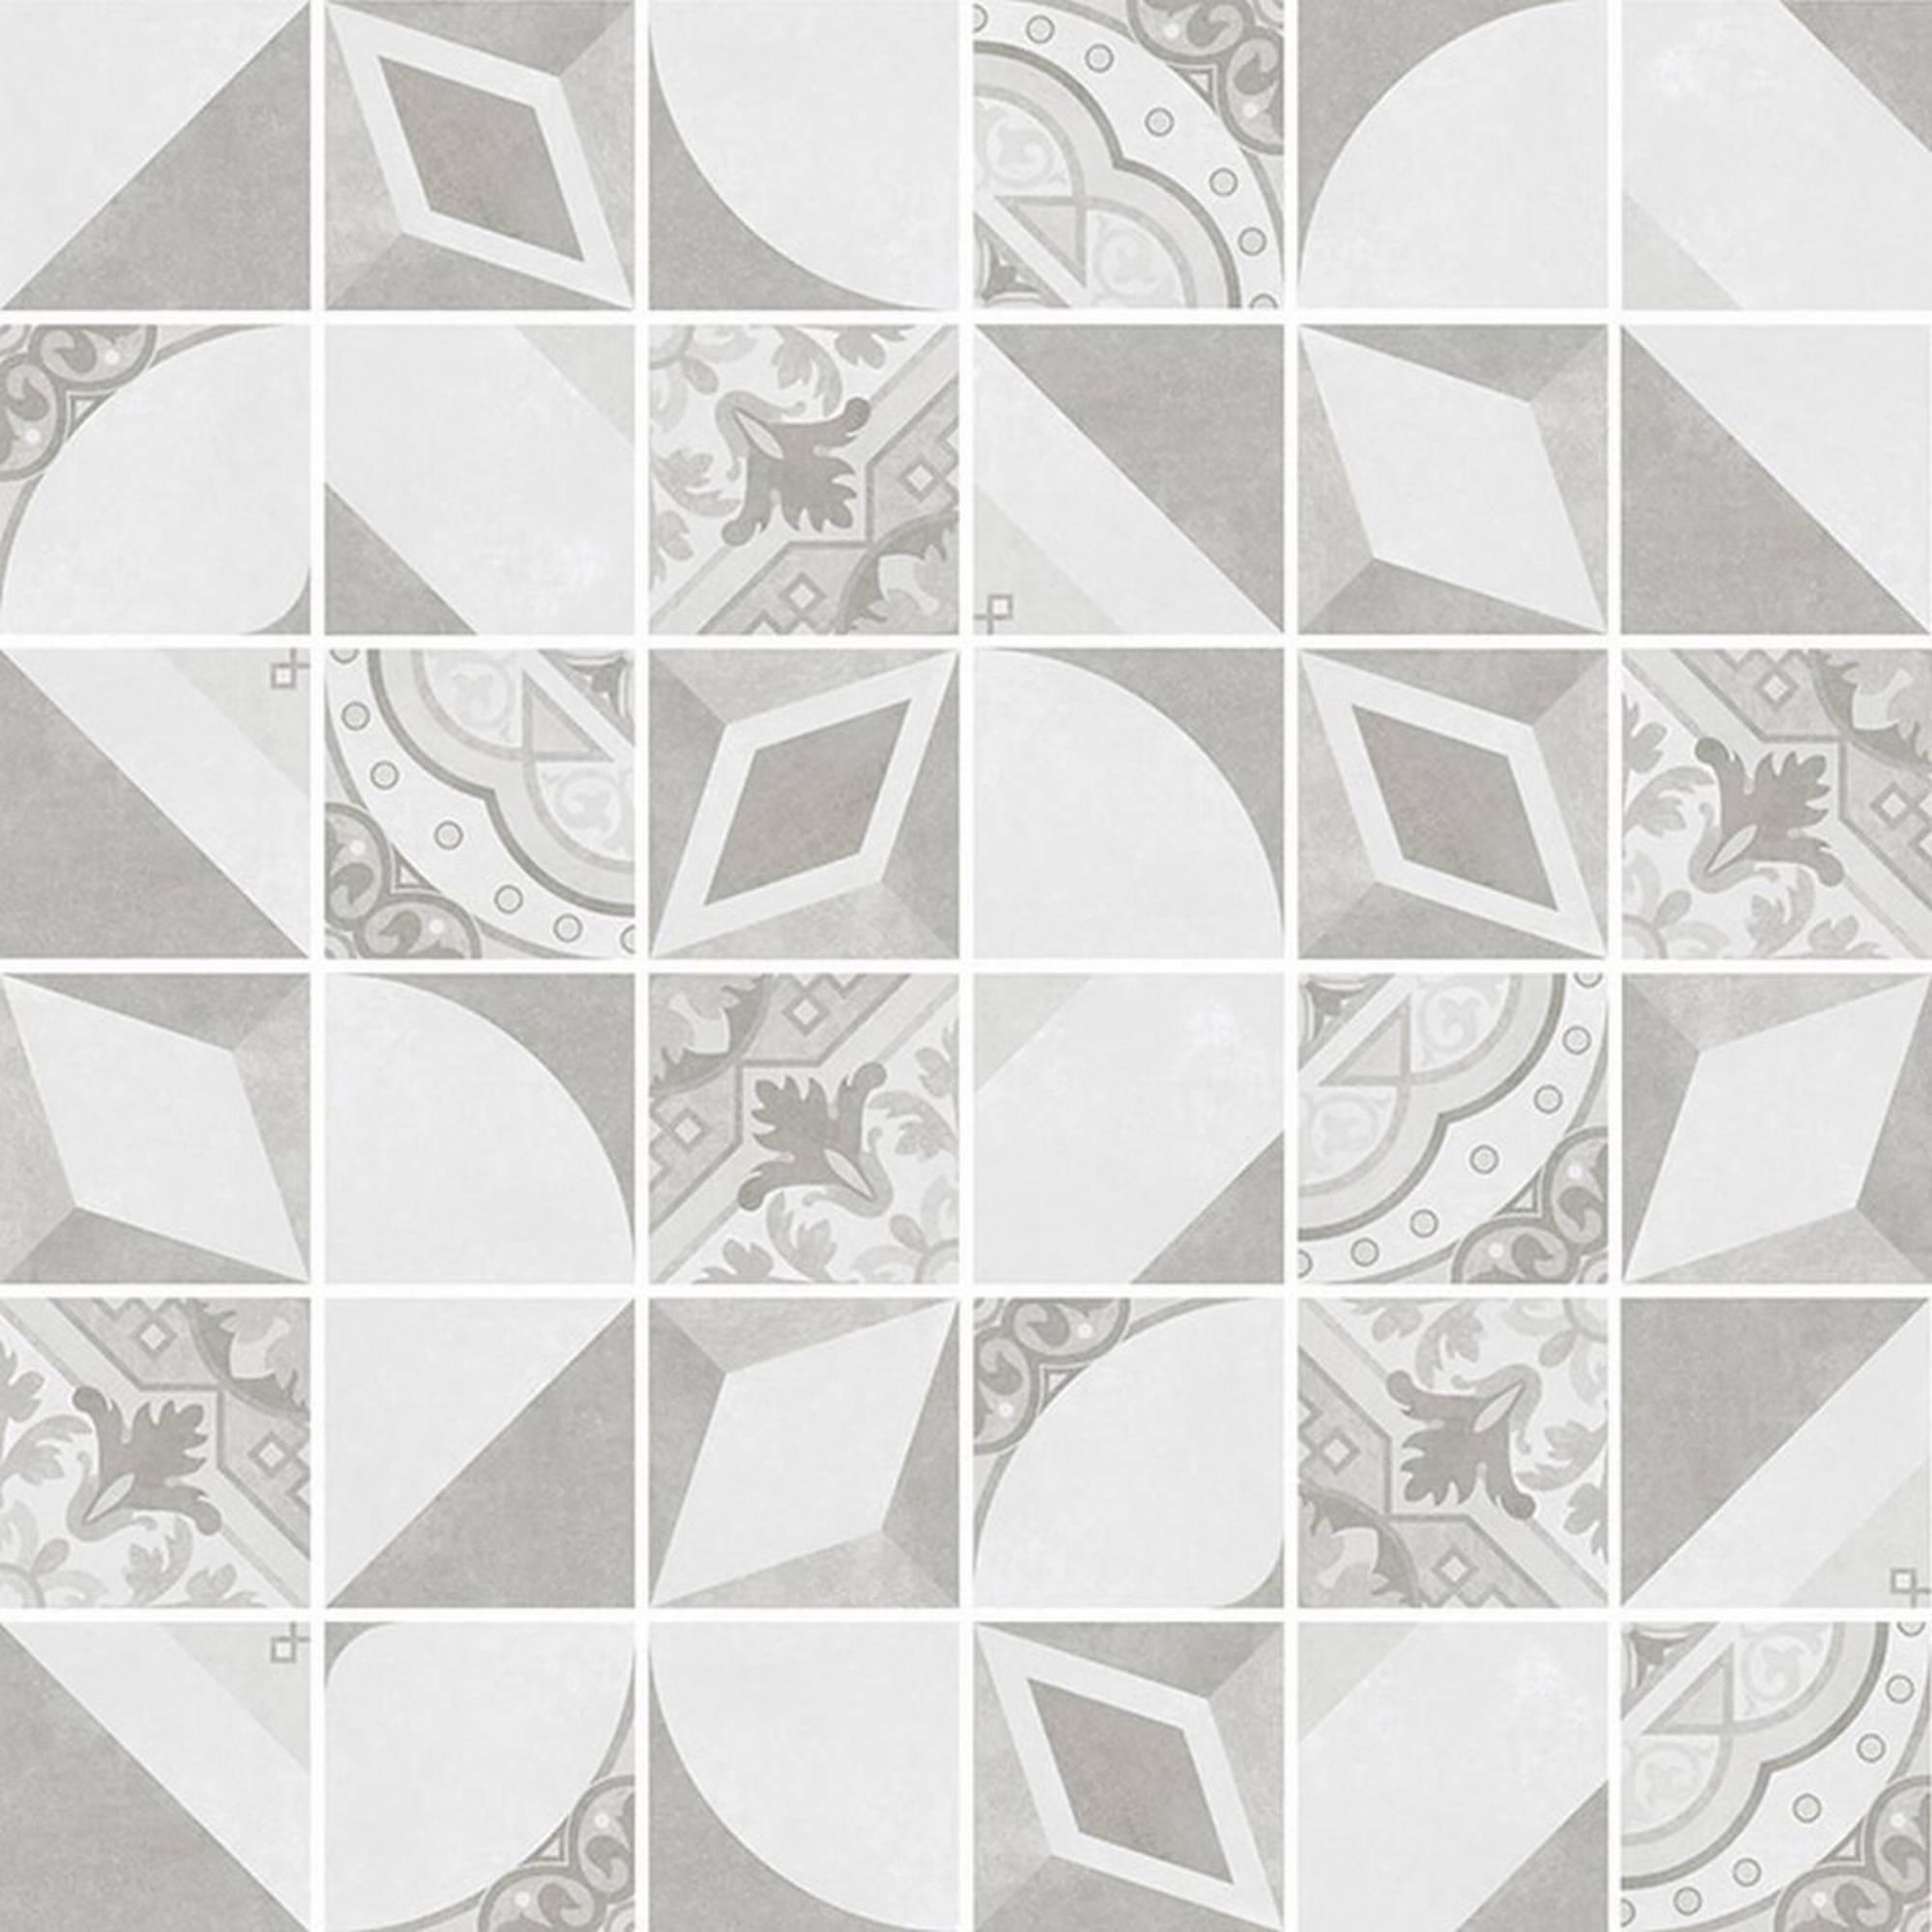 Villeroy & boch Century unlimited tegelmat 30 x 30 cm. blok 5 x 5 cm. a 11 stuks, grijs